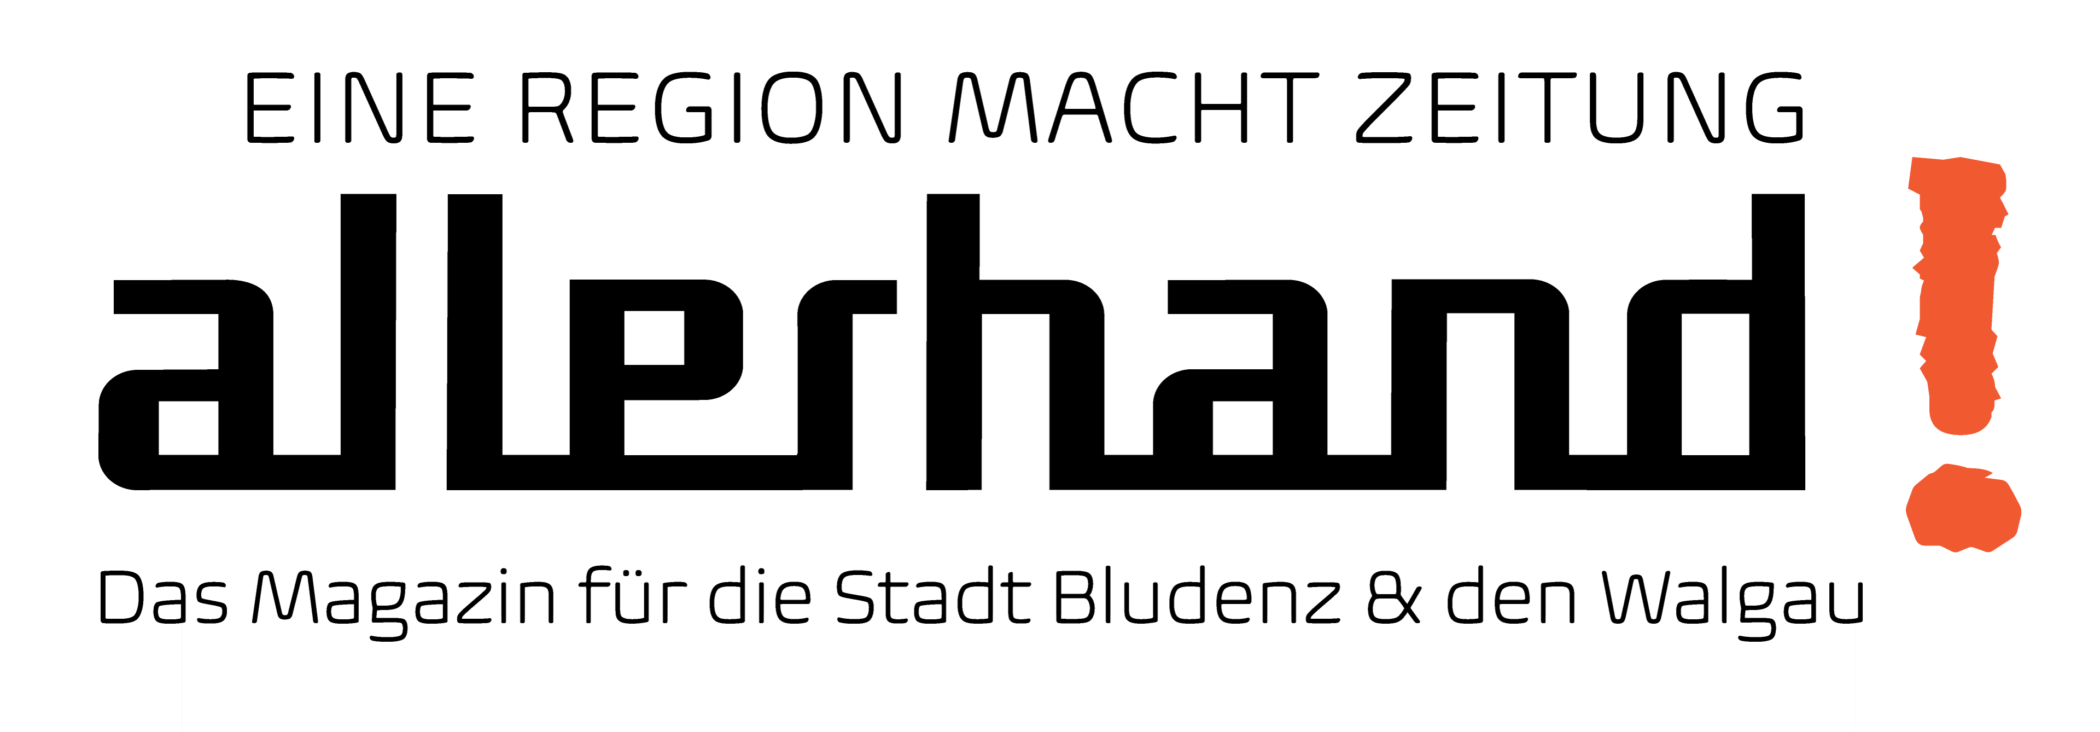 Allerhand-Logo_Schriftzug